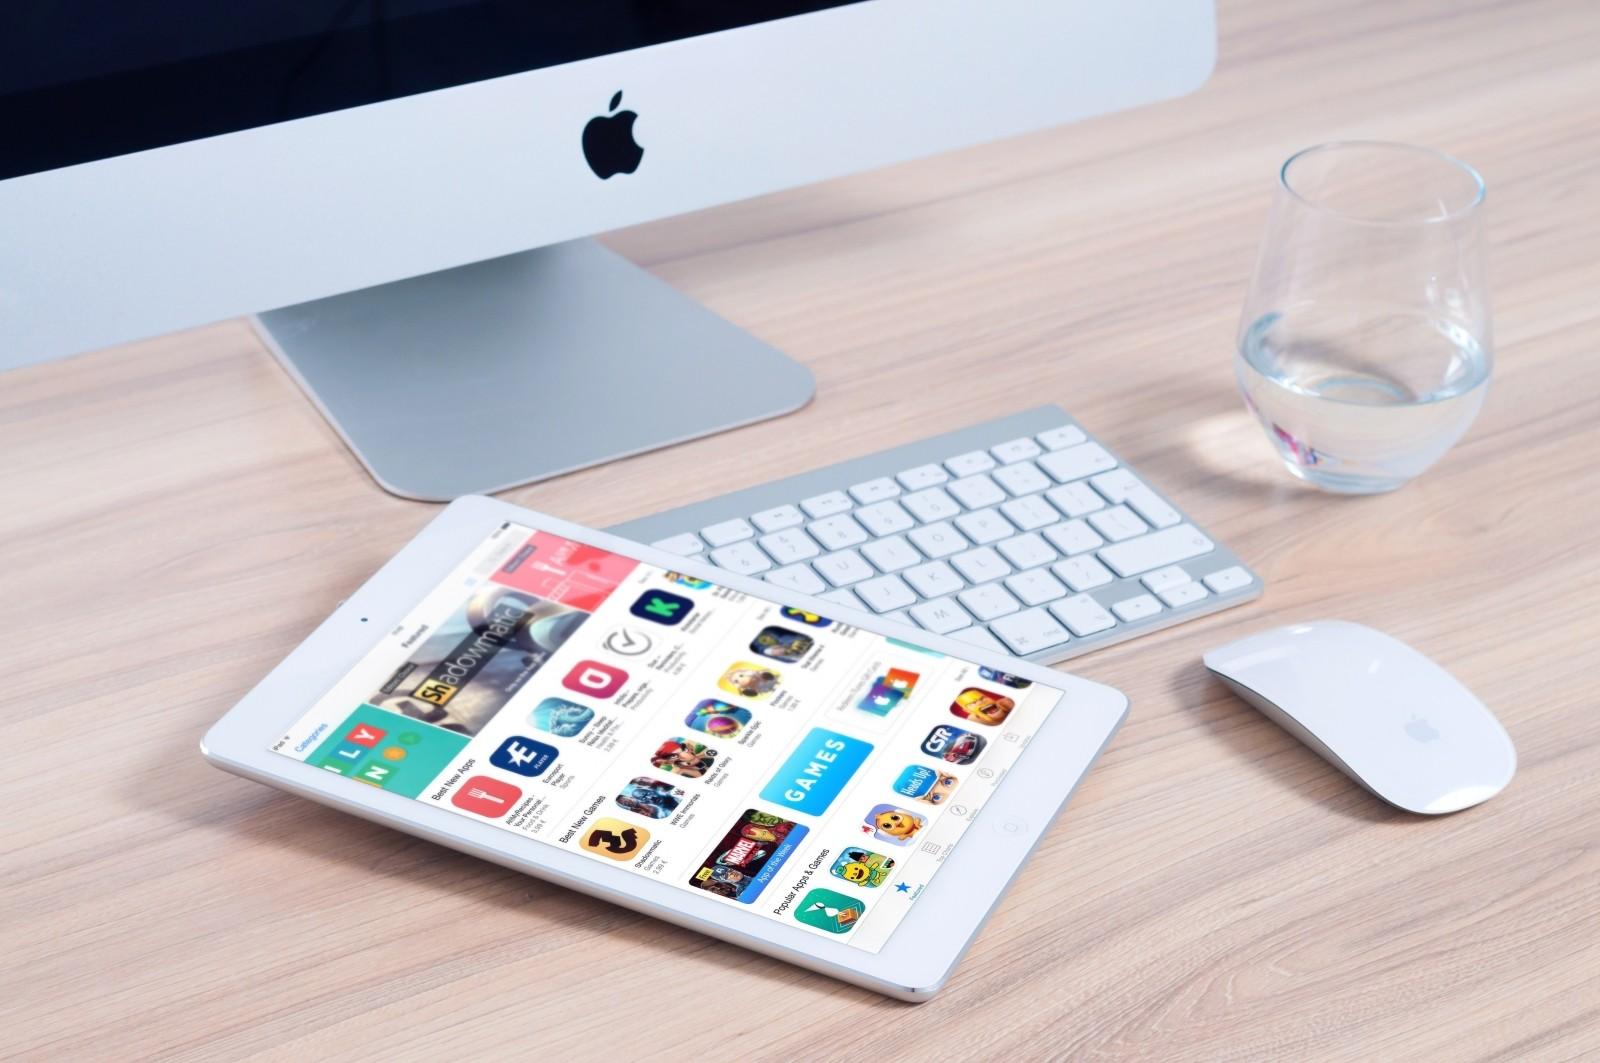 imac-apple-mockup-app-ipad-mouse-device-design